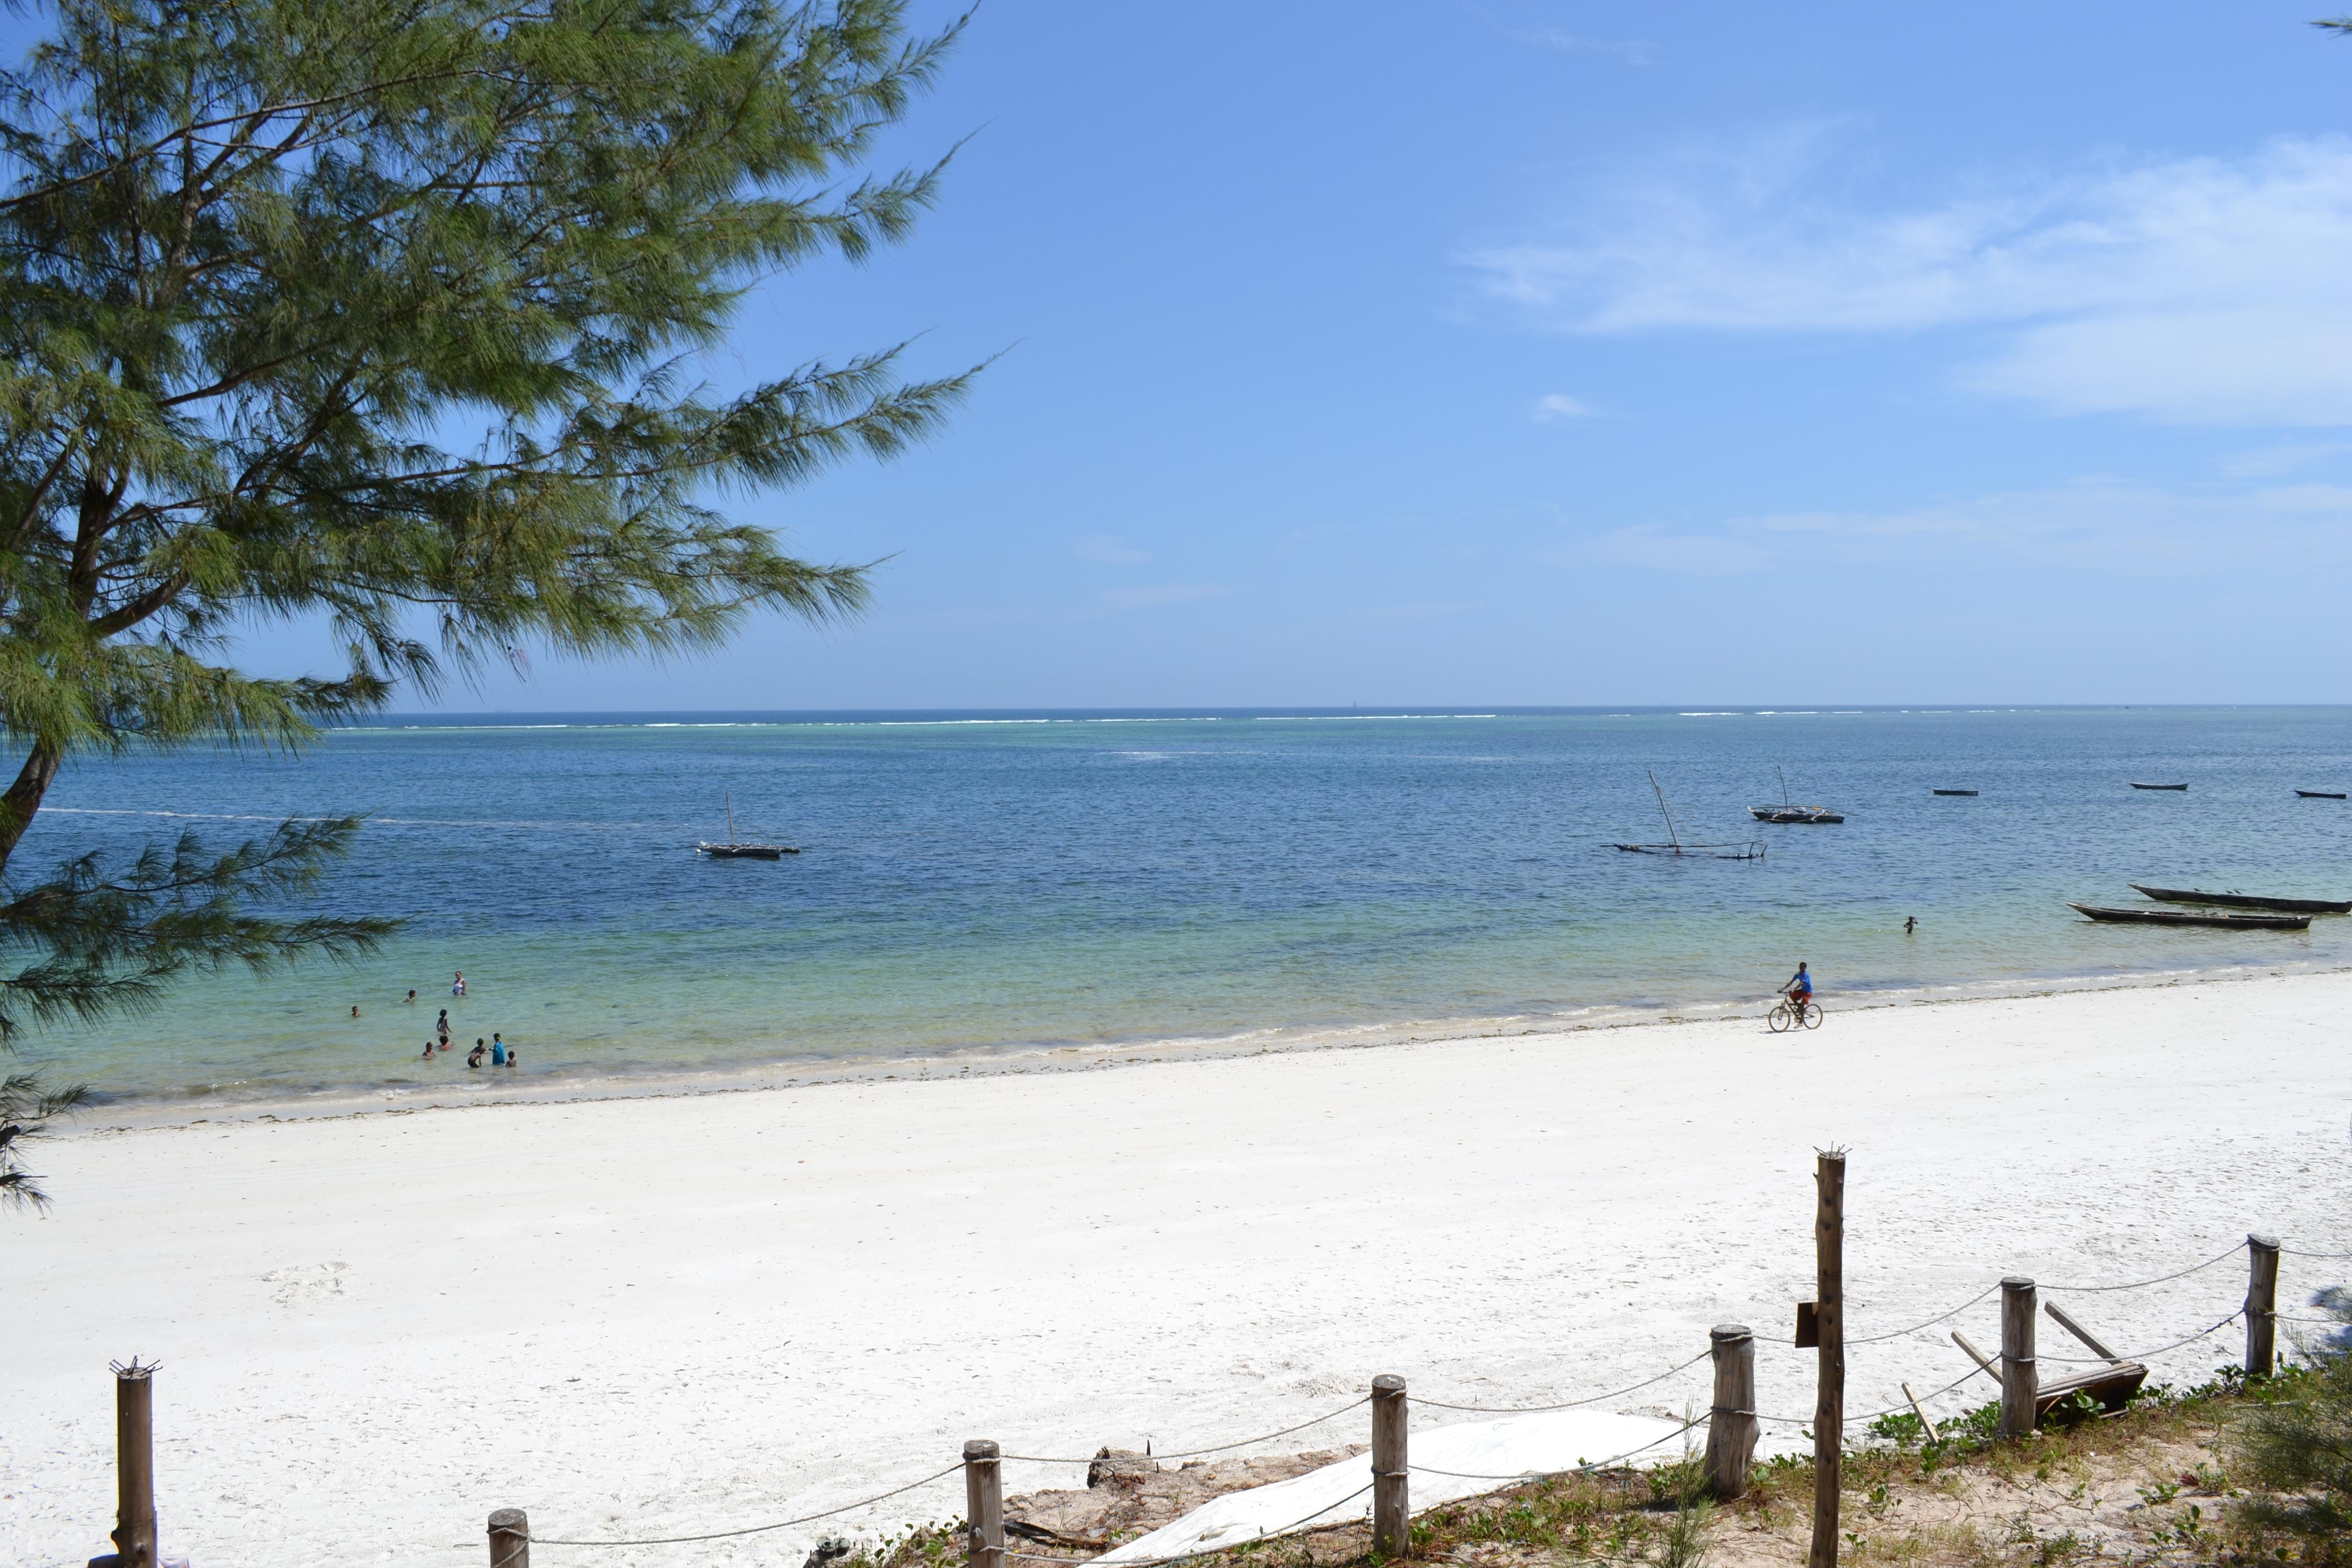 Hotel The Reef Coco Beach Resort